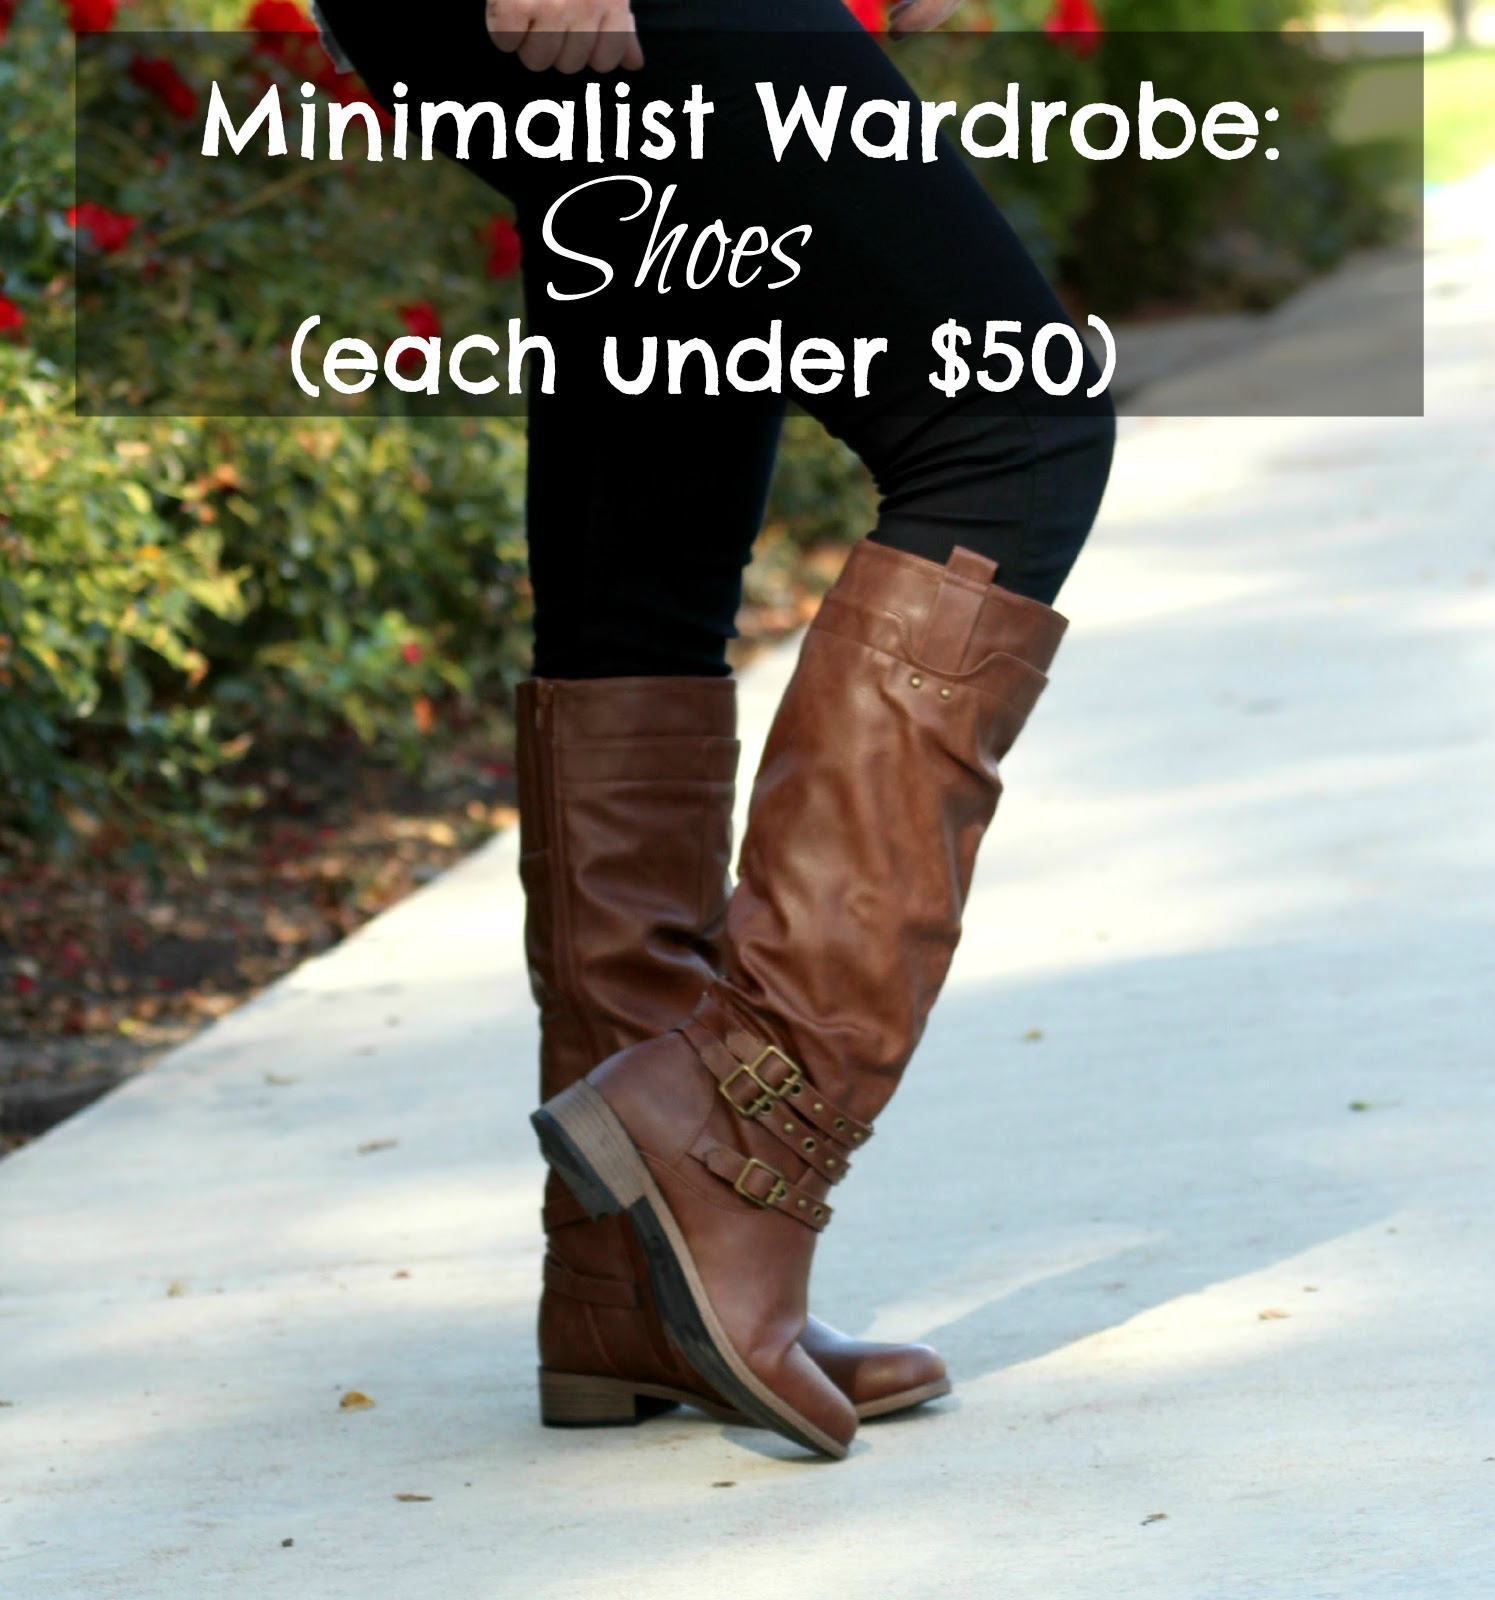 Minimalist-Wardrobe-Shoes